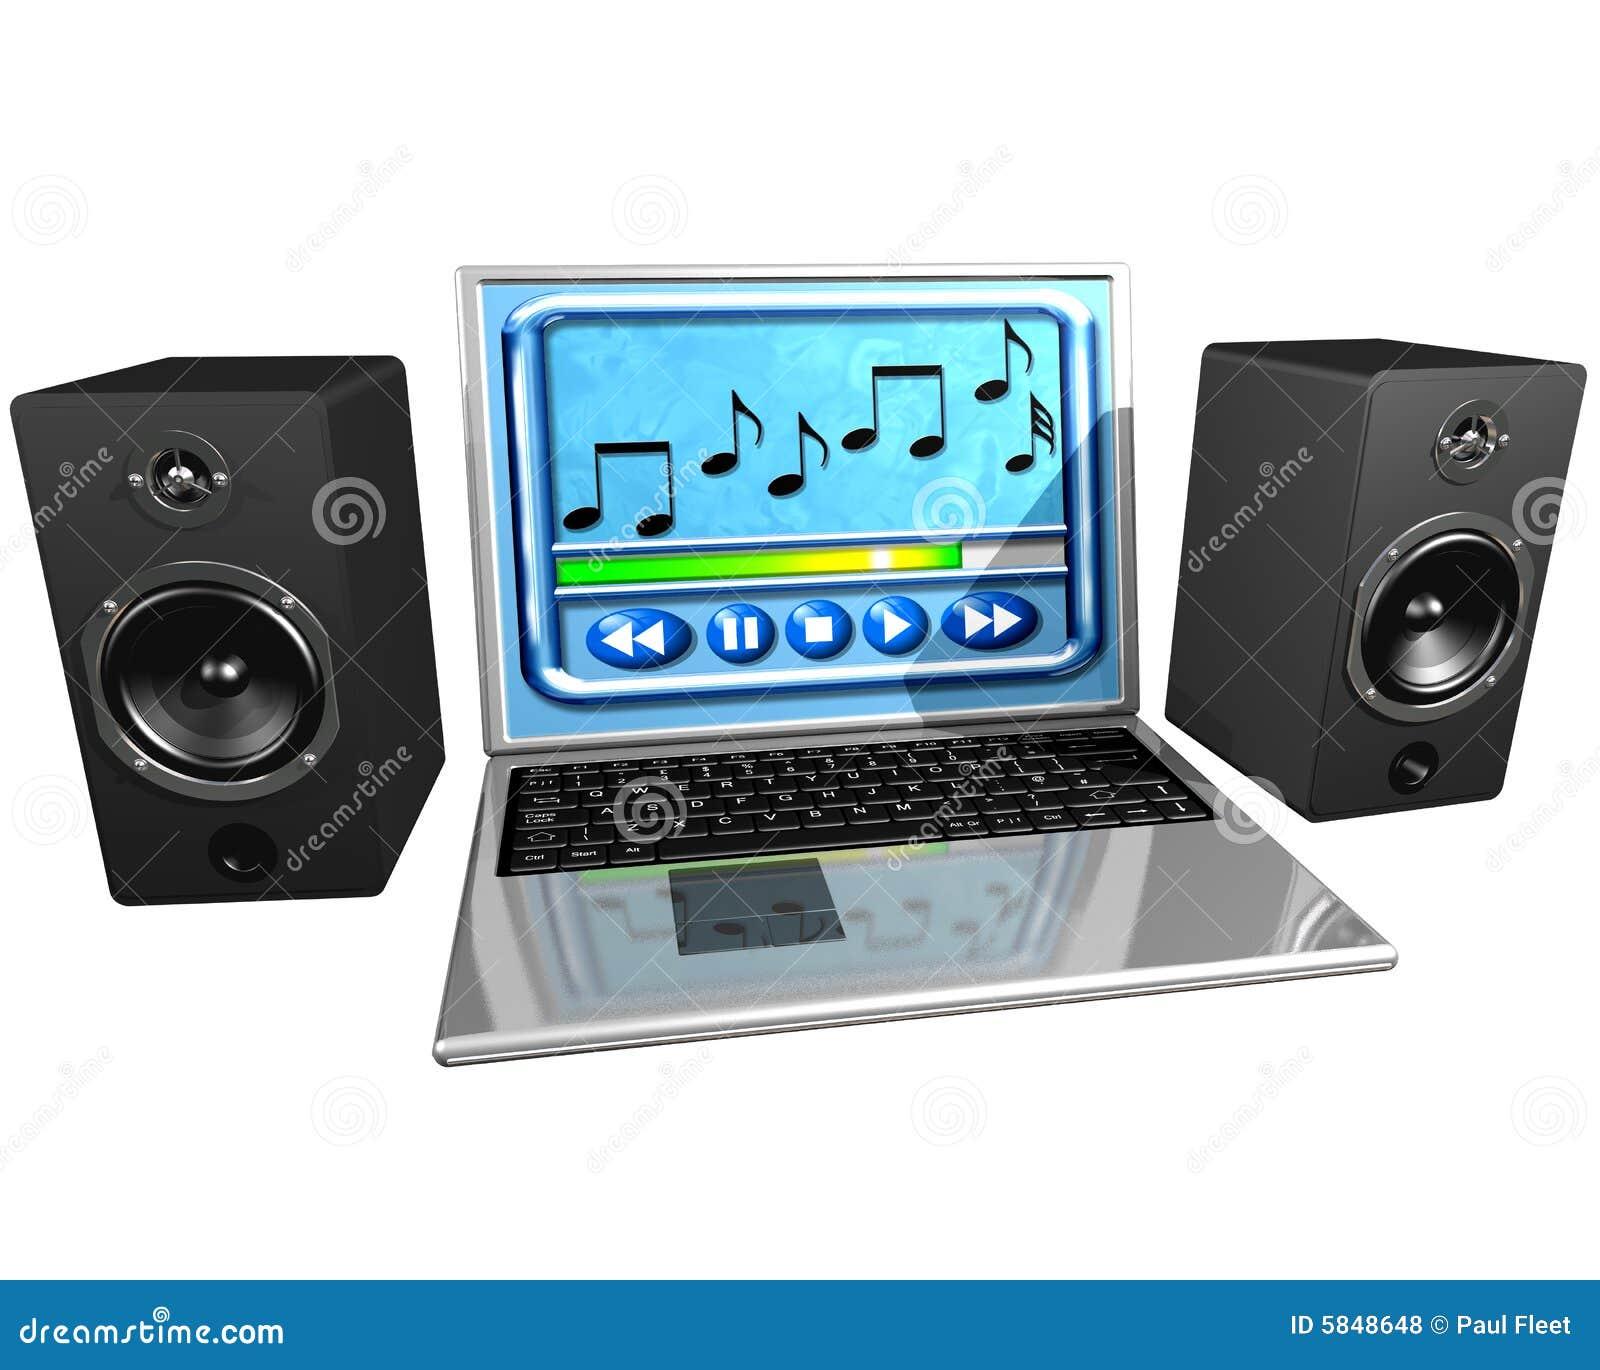 Computer music august 2016 - 0